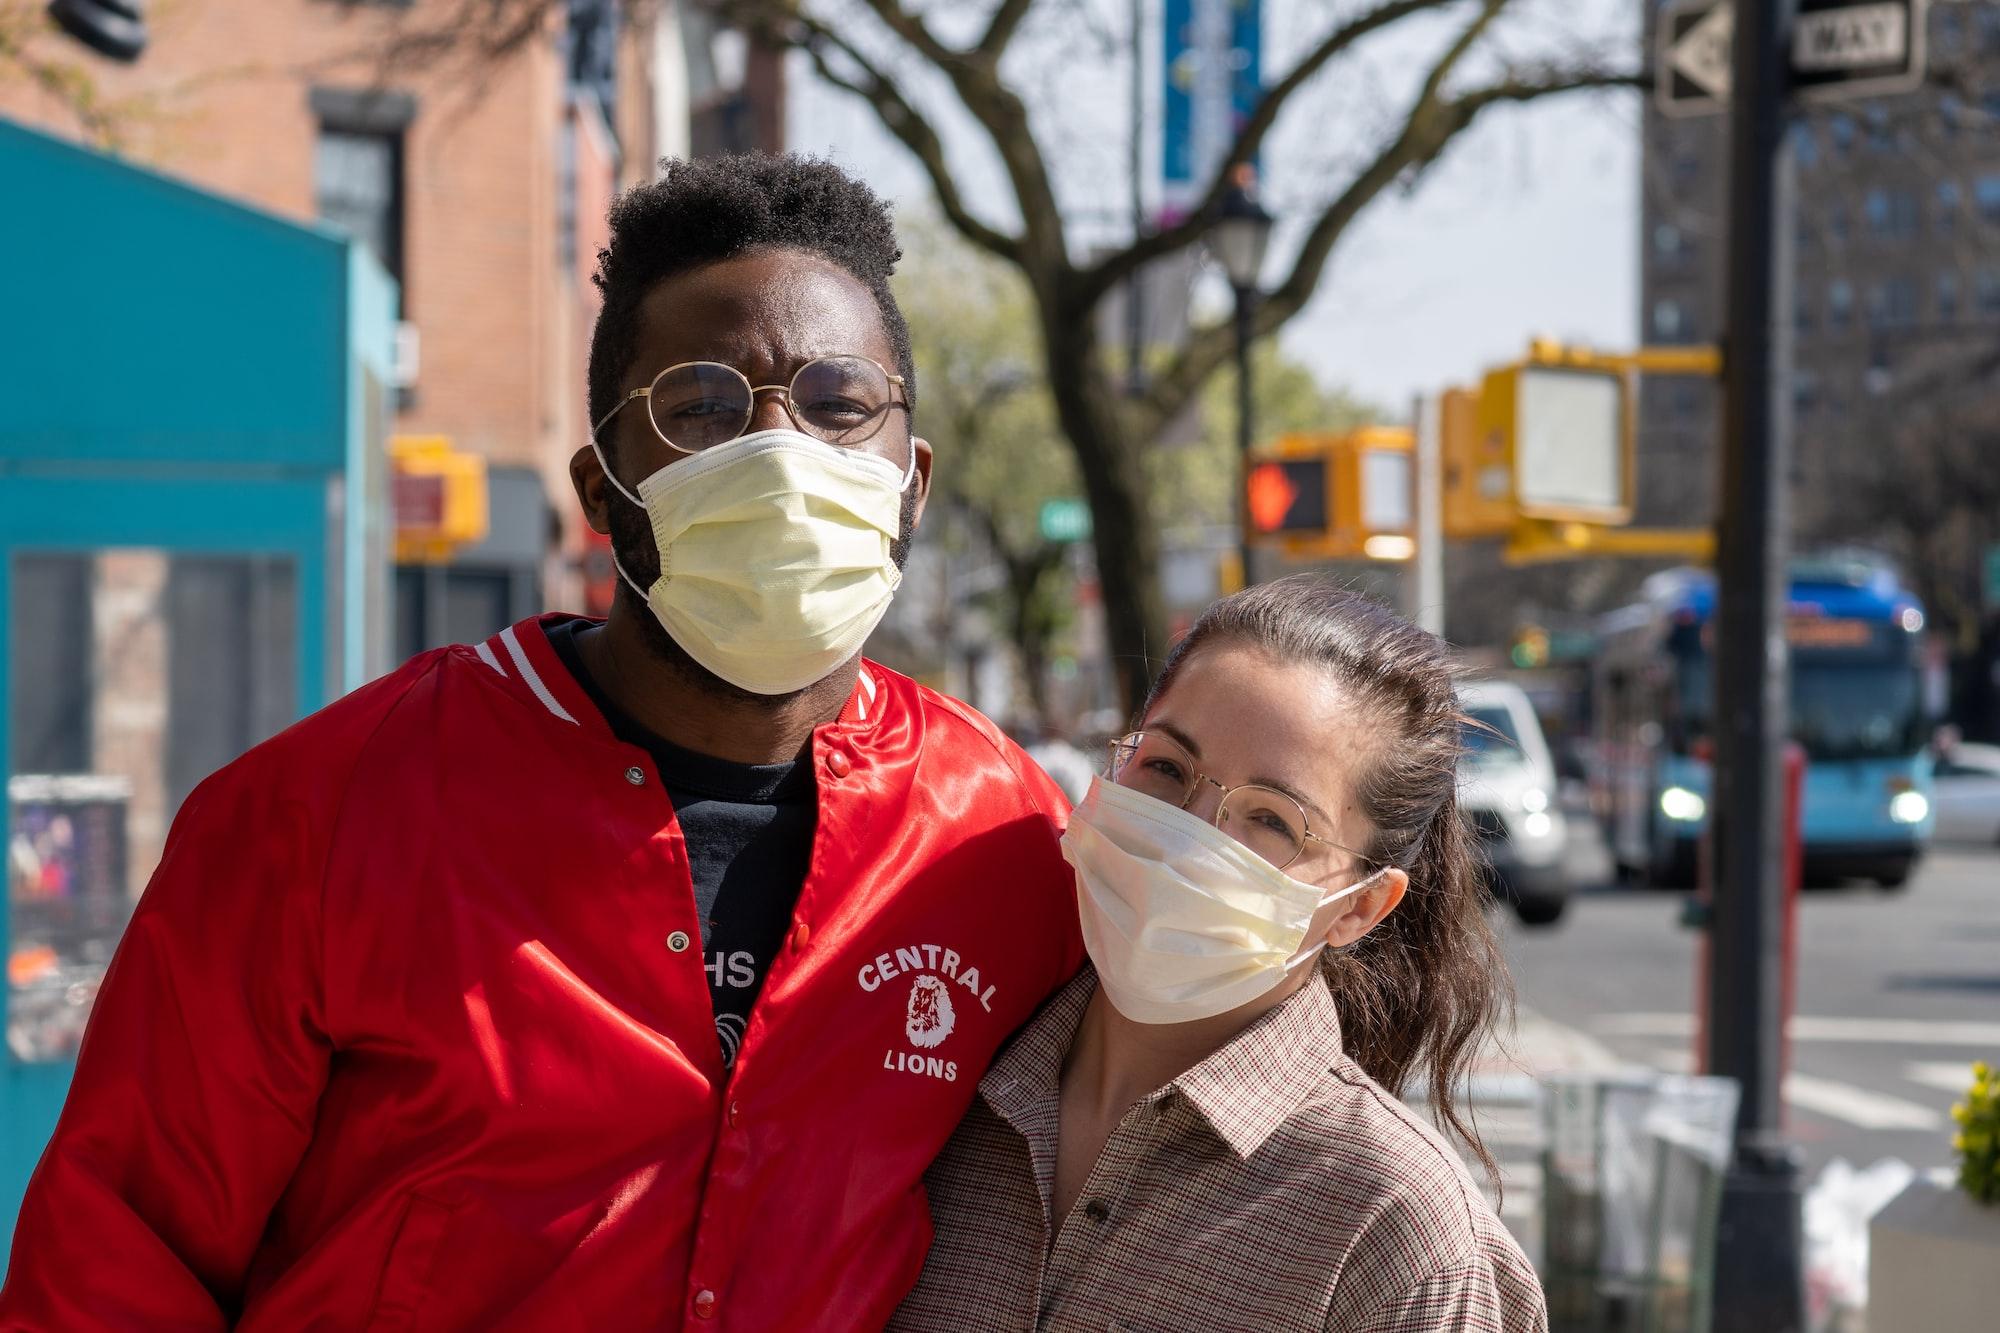 A couple enjoying the sunshine during New York City's #Coronavirus Quarantine, found walking up Flatbush Avenue in Brooklyn. #NYC #Covid